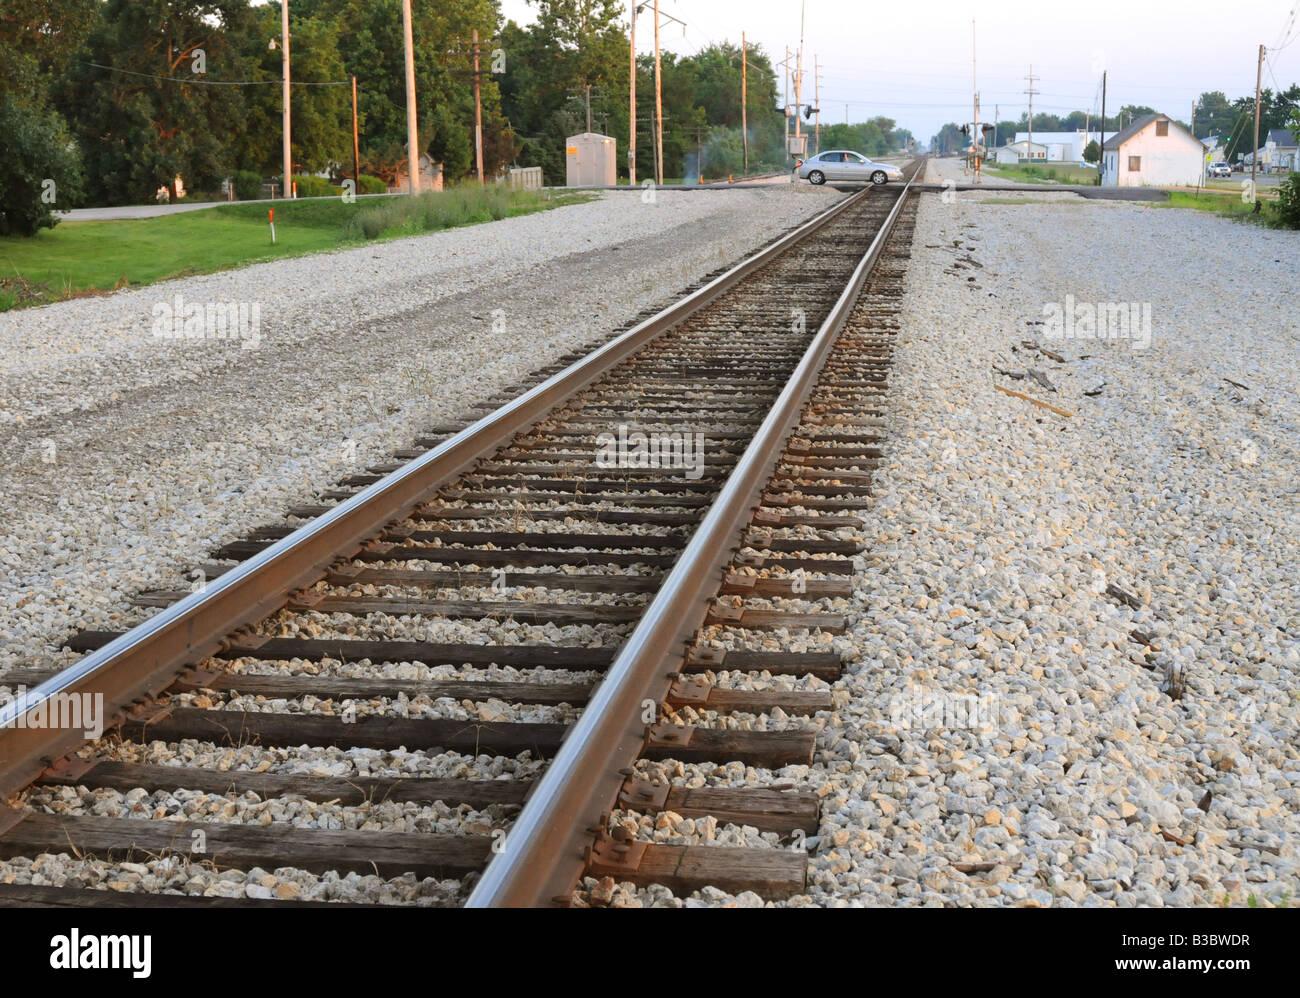 Railroad tracks - Stock Image